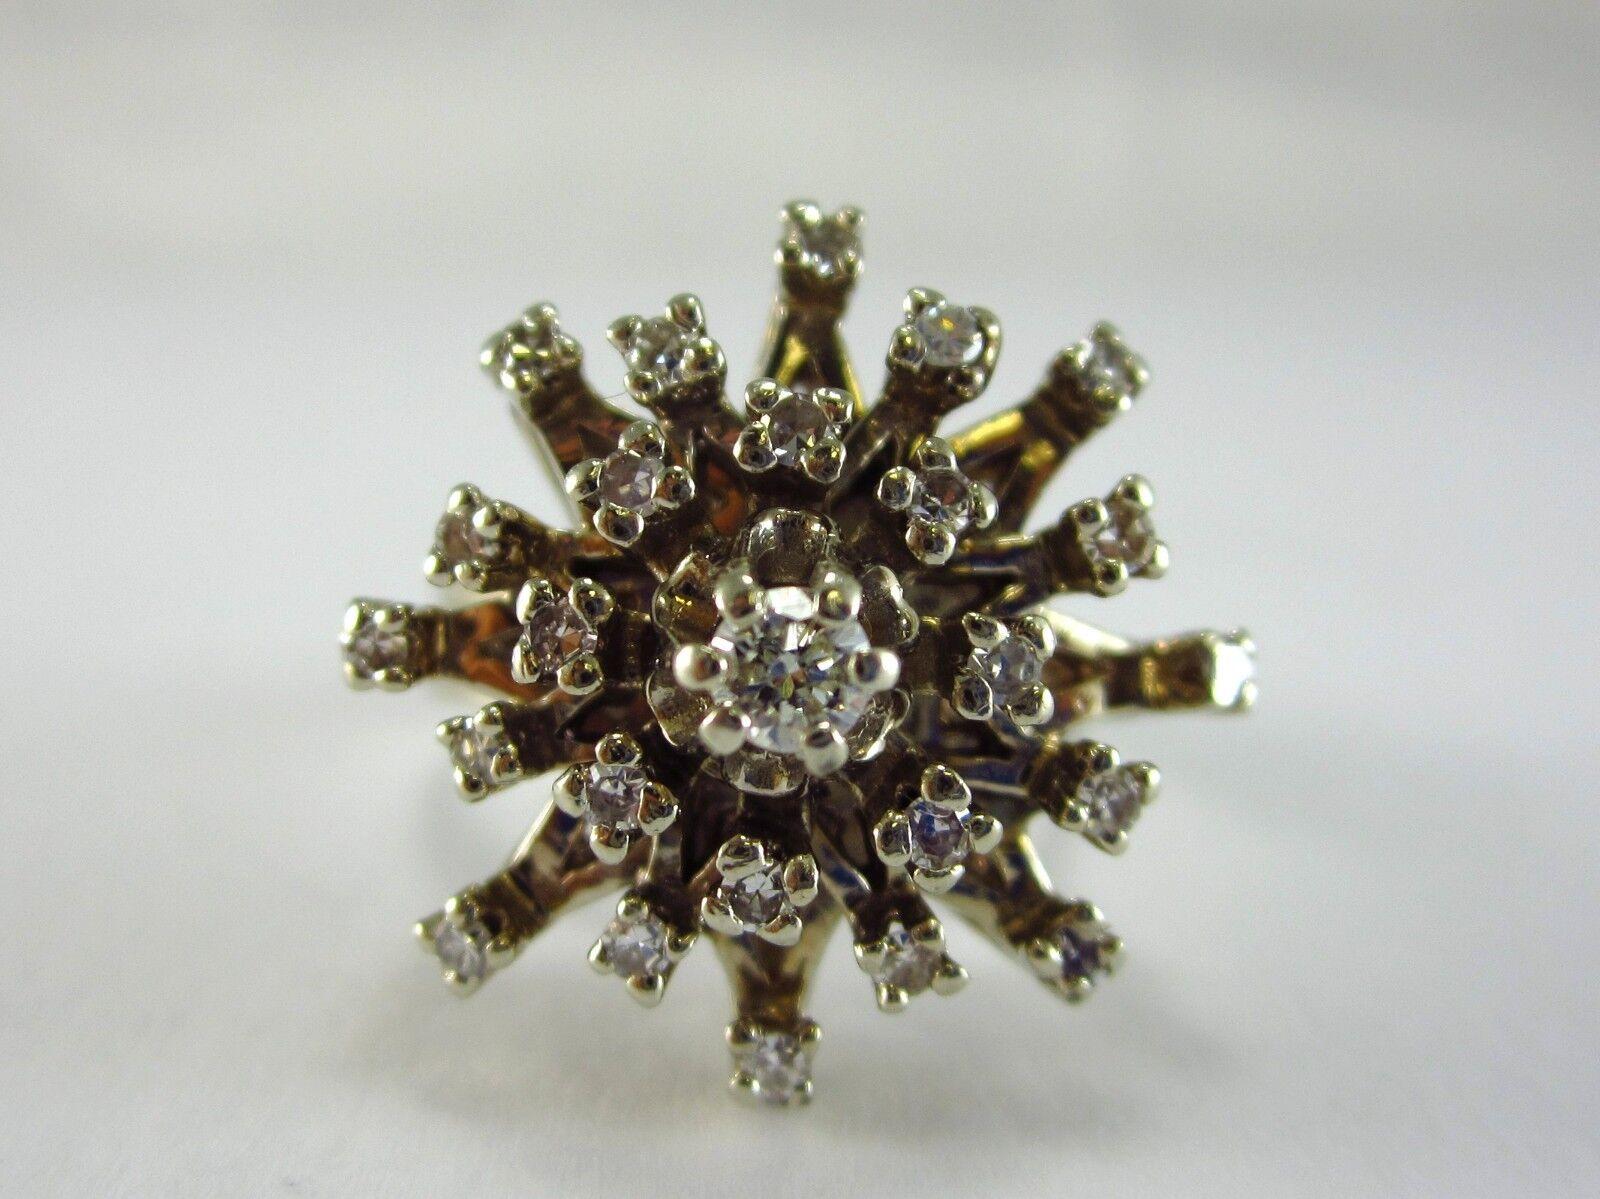 BEAUTIFUL LADIES 14K WHITE gold DIAMOND CLUSTER RING 9.9G 0.84CT SZ 8.25